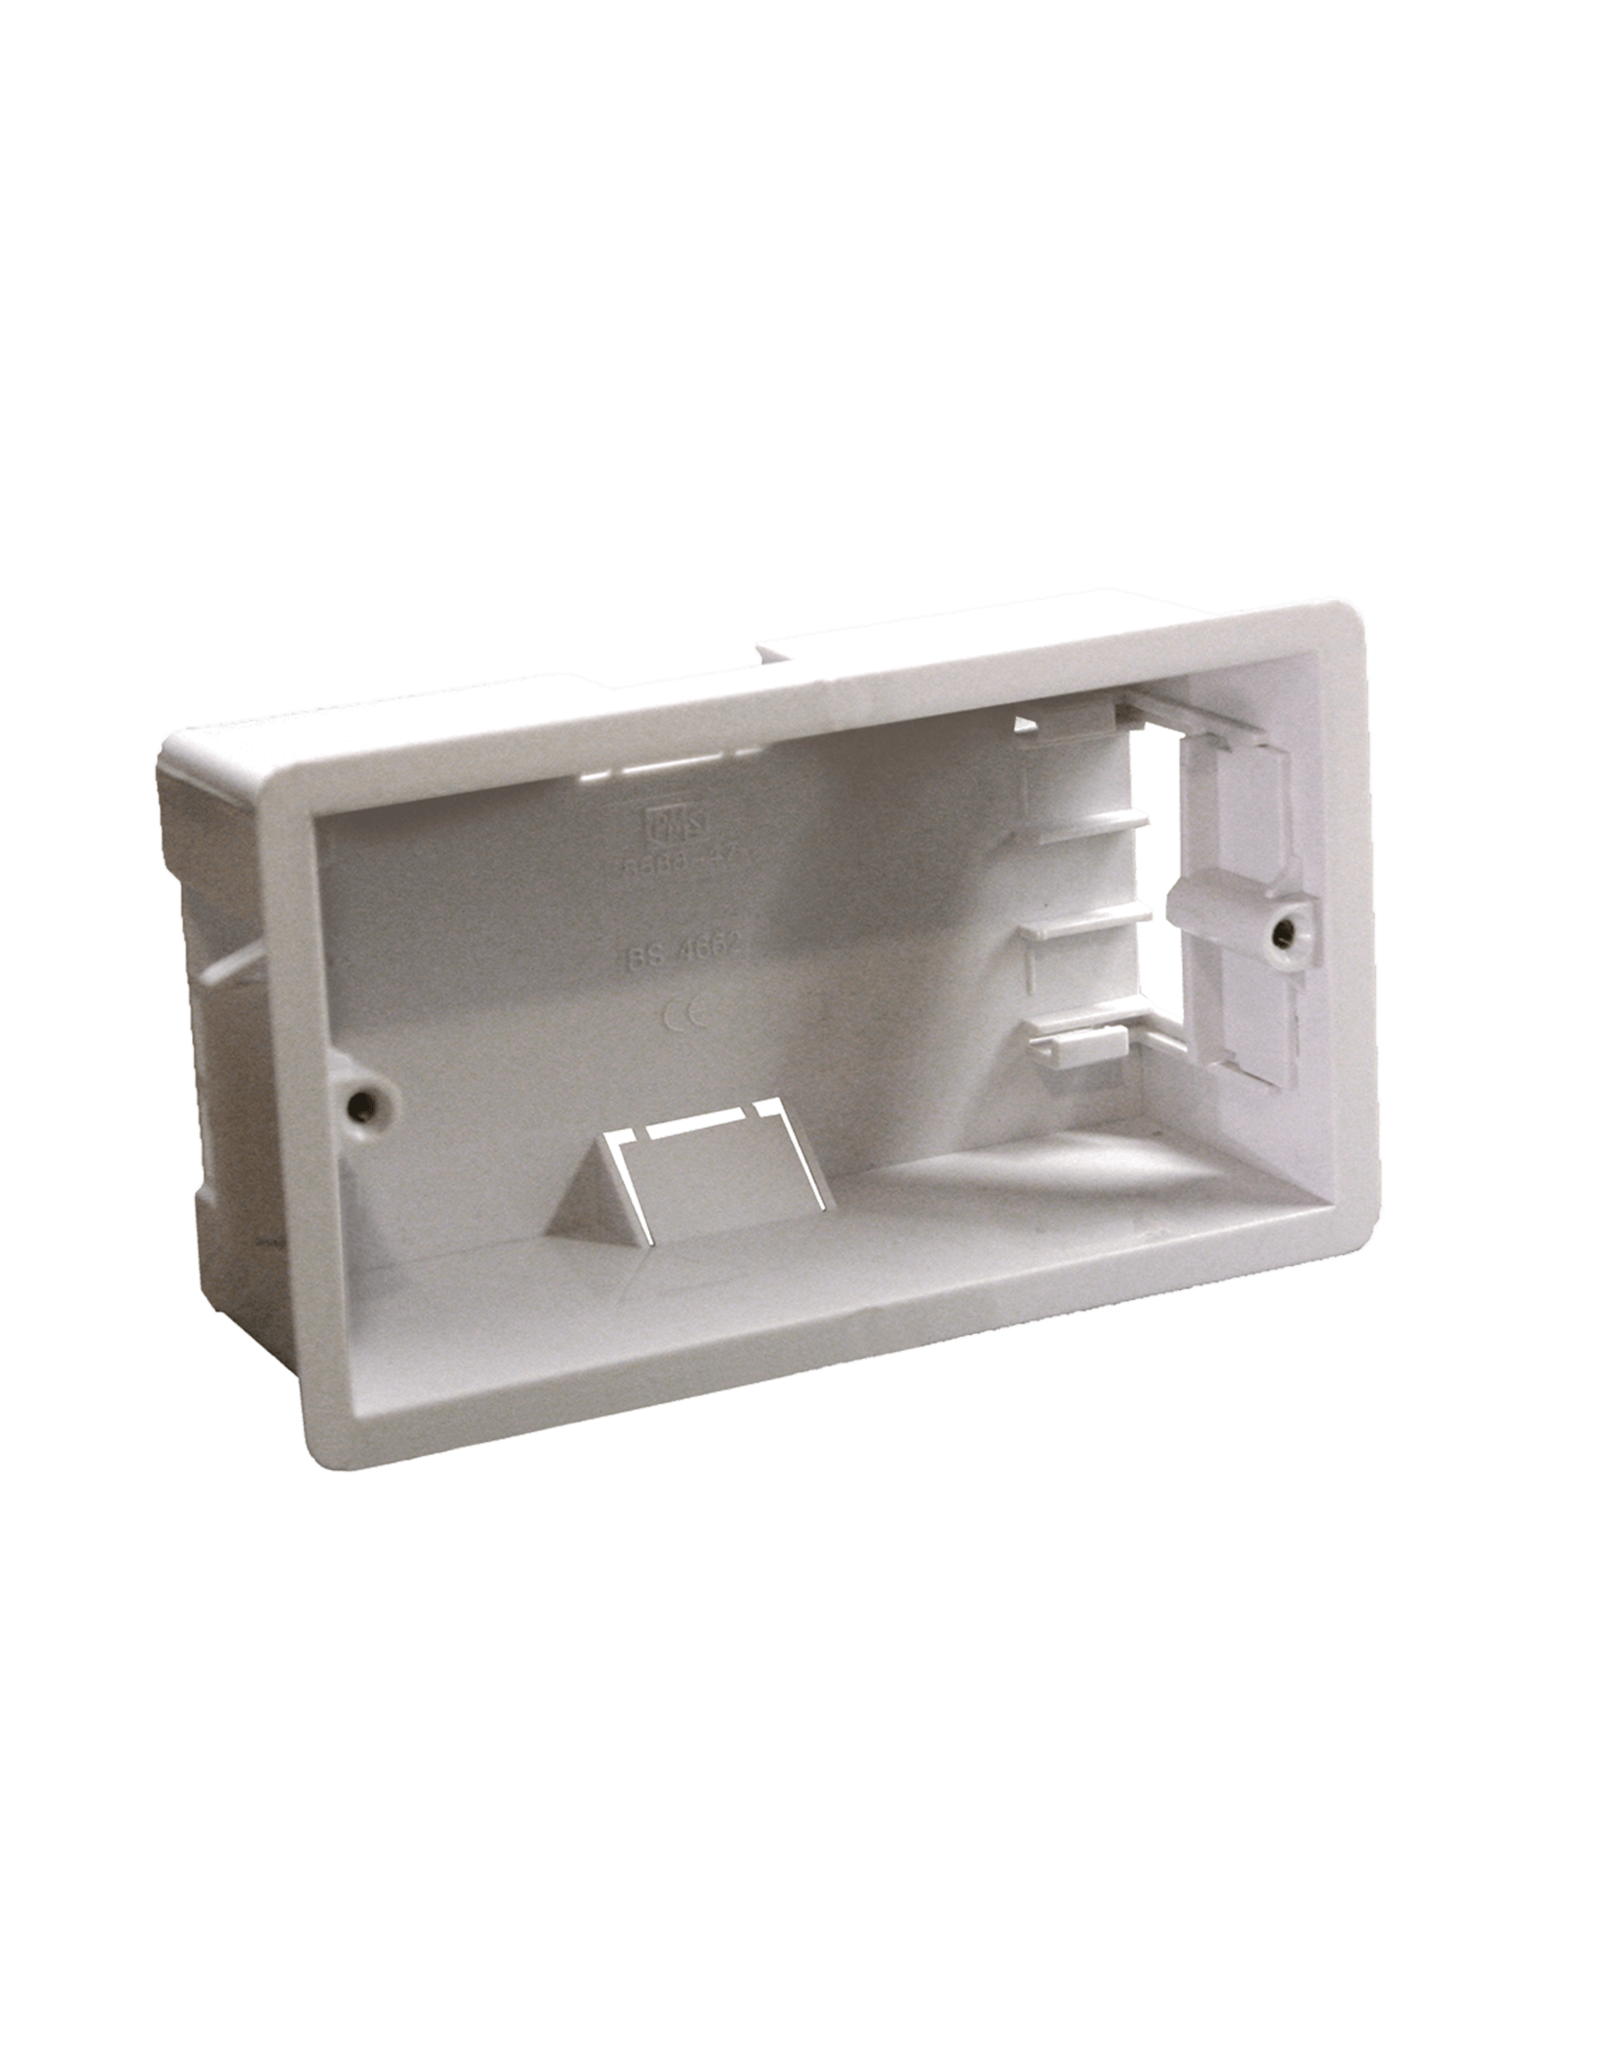 Audac Flush mount box for AUDAC wallpanel - hollow wall